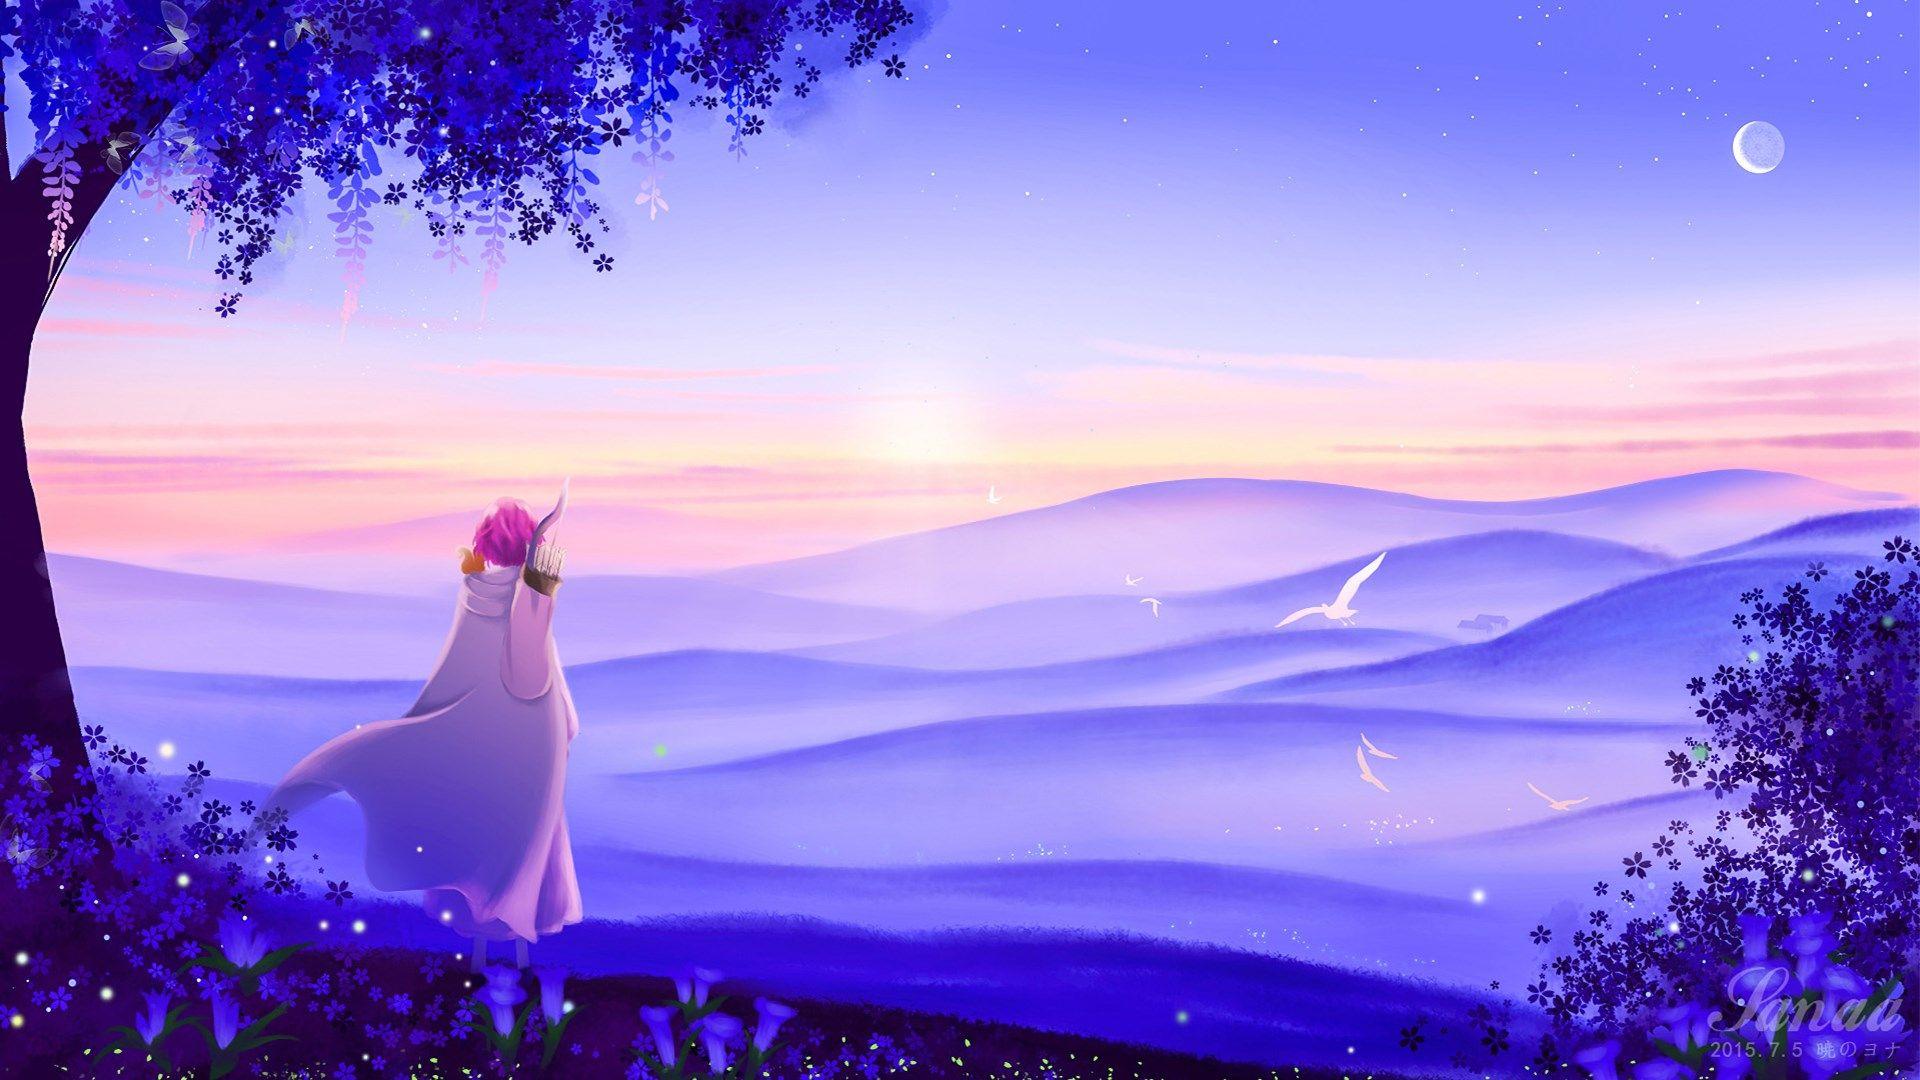 Yona Of The Dawn Pic Full Hd Backgrounds 1920x1080 313 Kb Akatsuki No Yona Anime Background Akatsuki